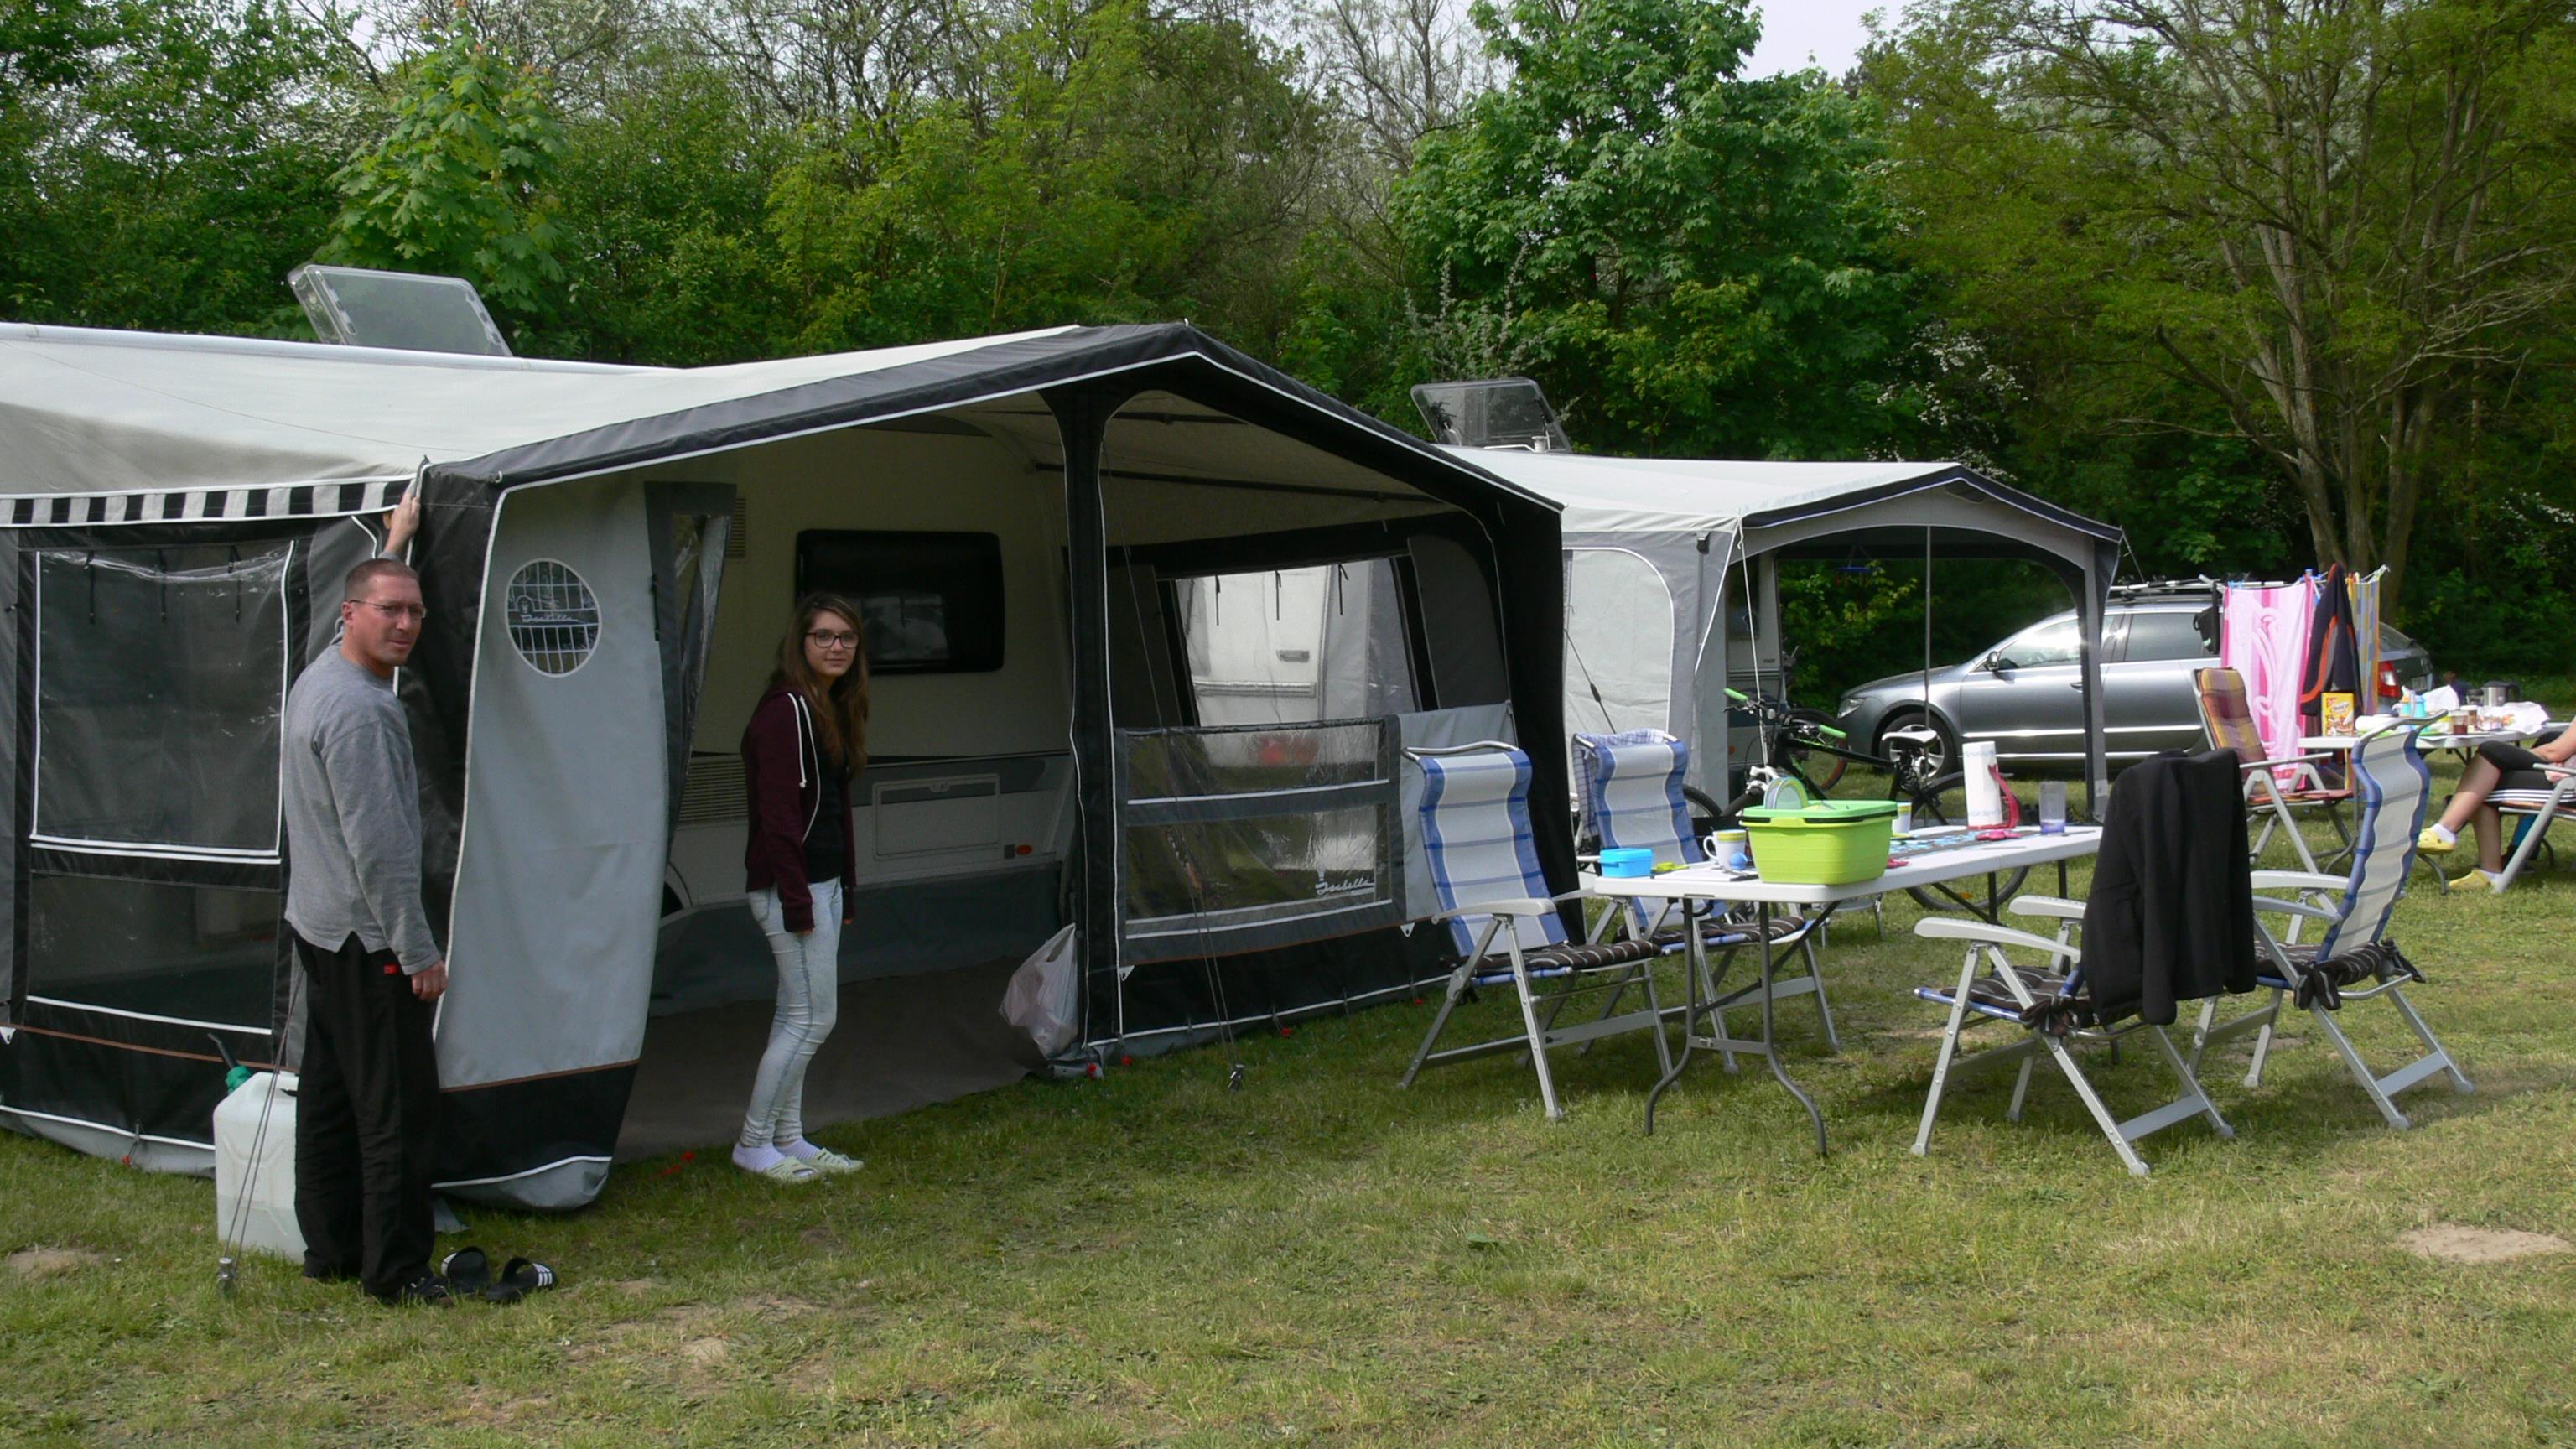 Emplacement - Emplacement Caravane / Camping-Car / Tente - Eurocamp Spreewaldtor